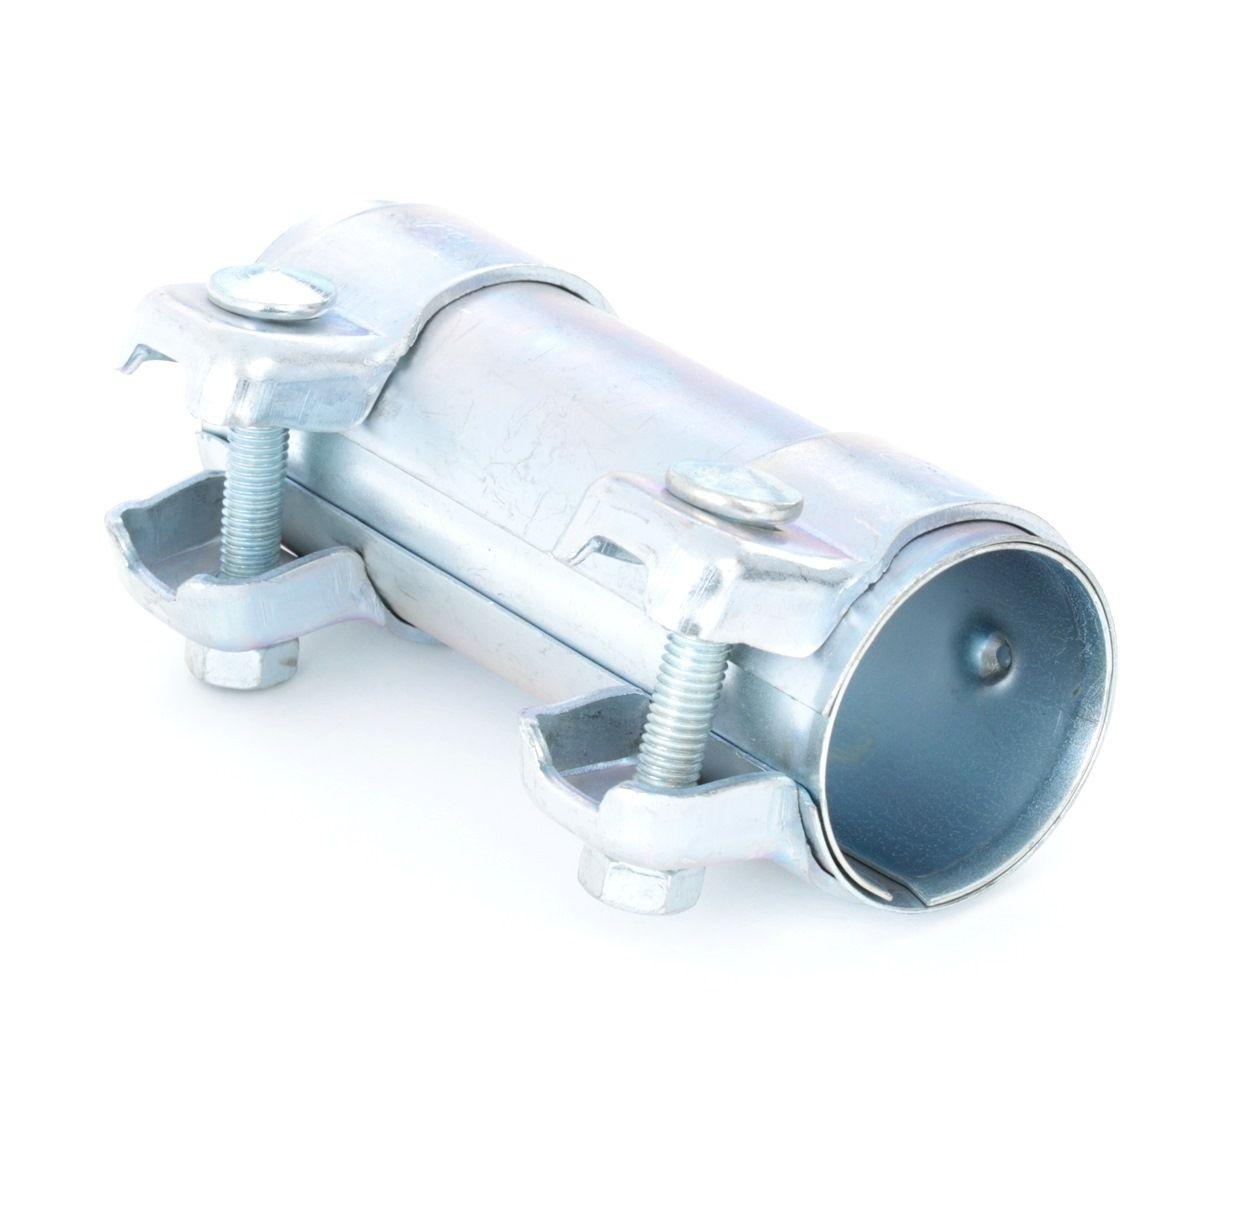 Rohrverbinder, Abgasanlage FA1 114-943 Bewertung